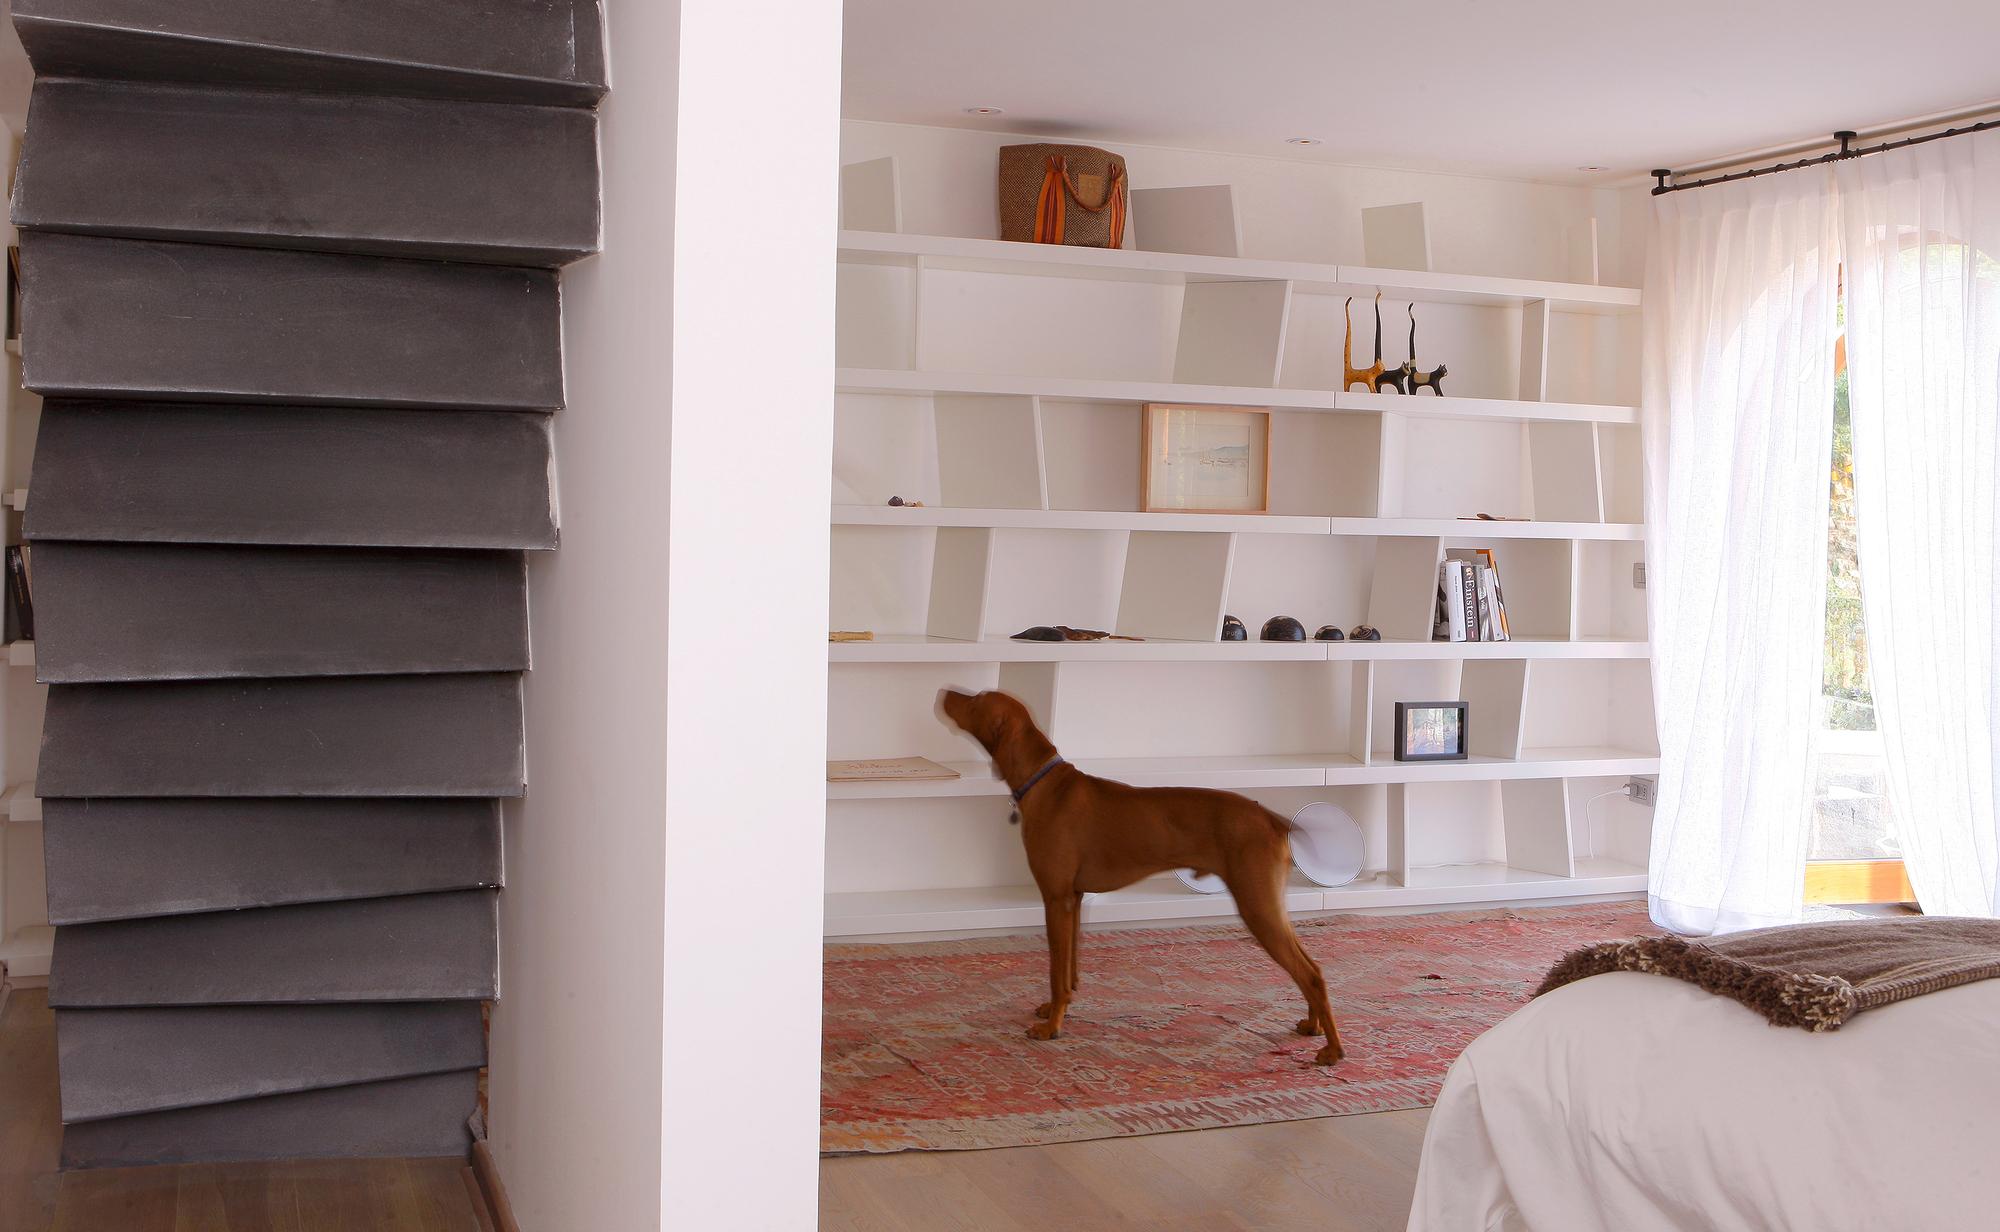 Caz Zegers Oficina Plataforma Arquitectura # Muebles Dentales Selecto